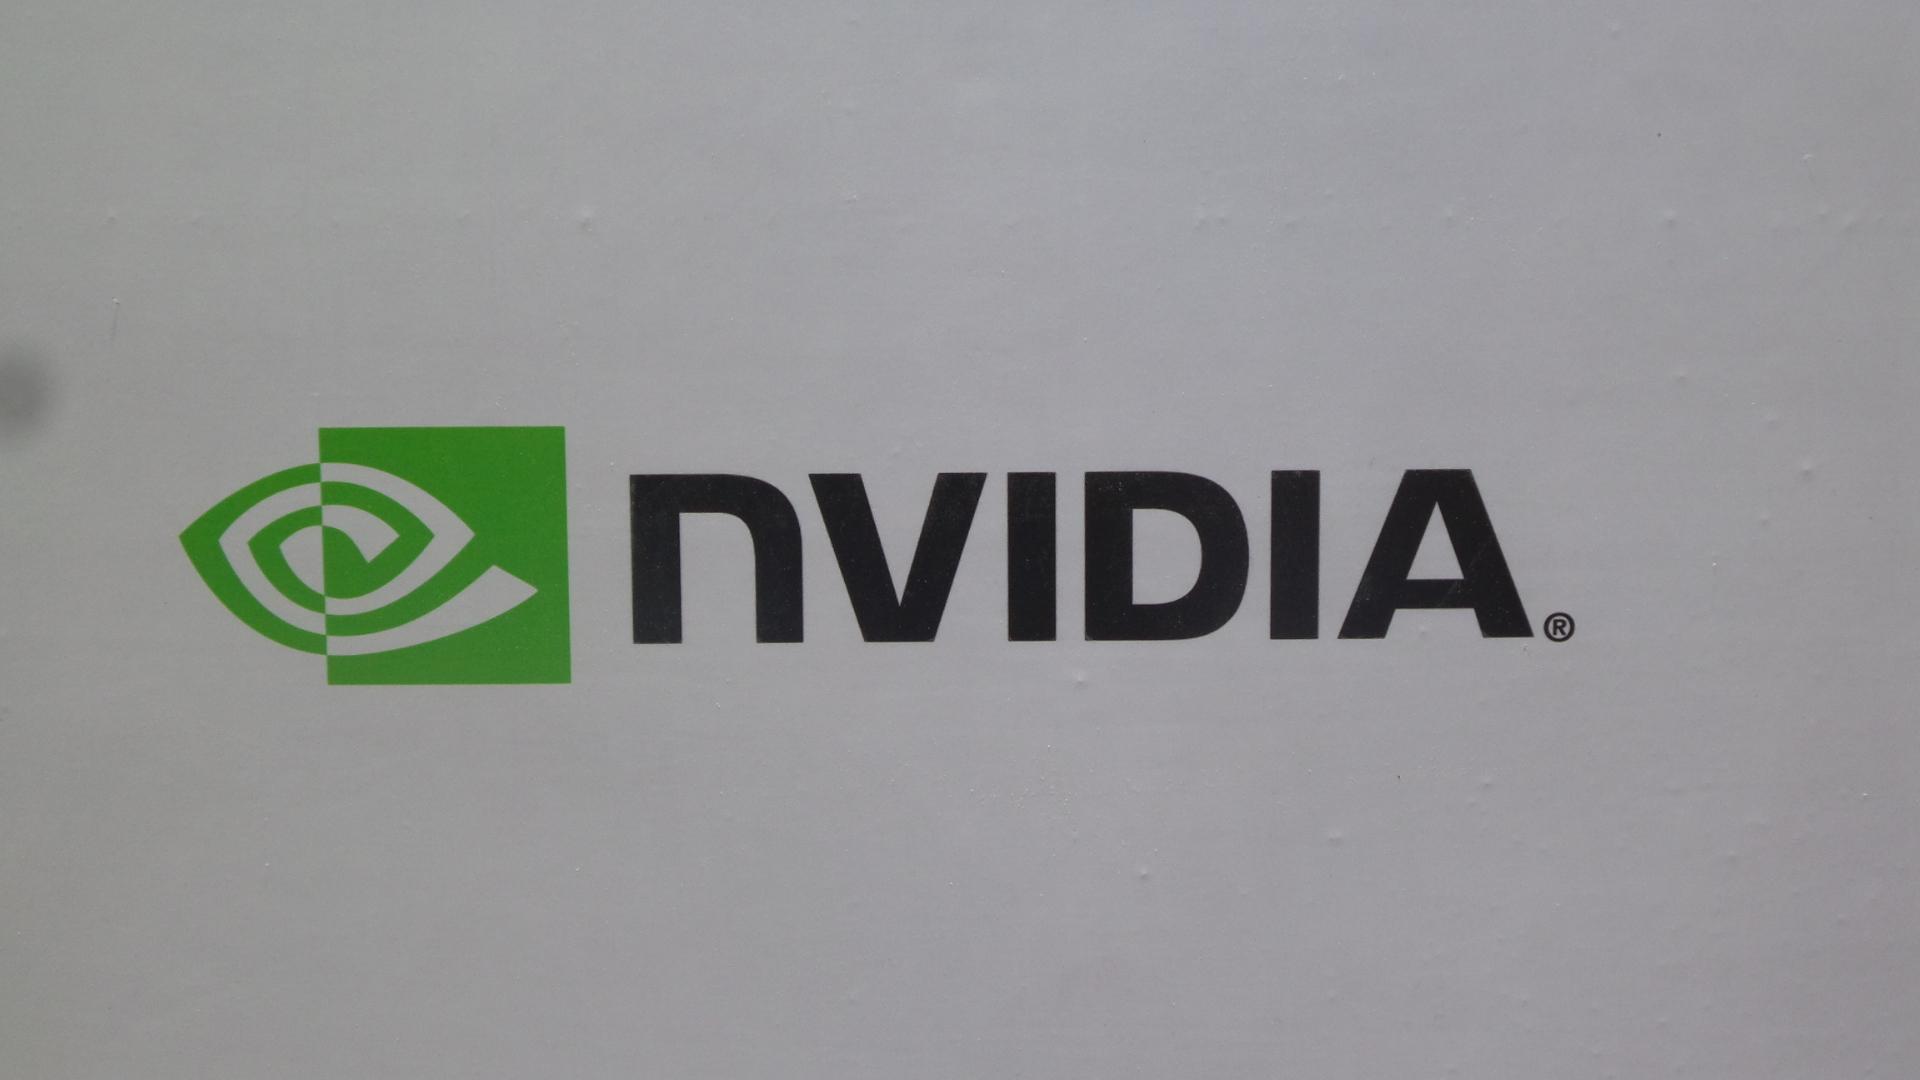 NVIDIA อาจจะมี GTX 1070 Ti ออกมาเซอร์ไพรซ์คอเกม ด้าน 1080 Ti มีชัวร์